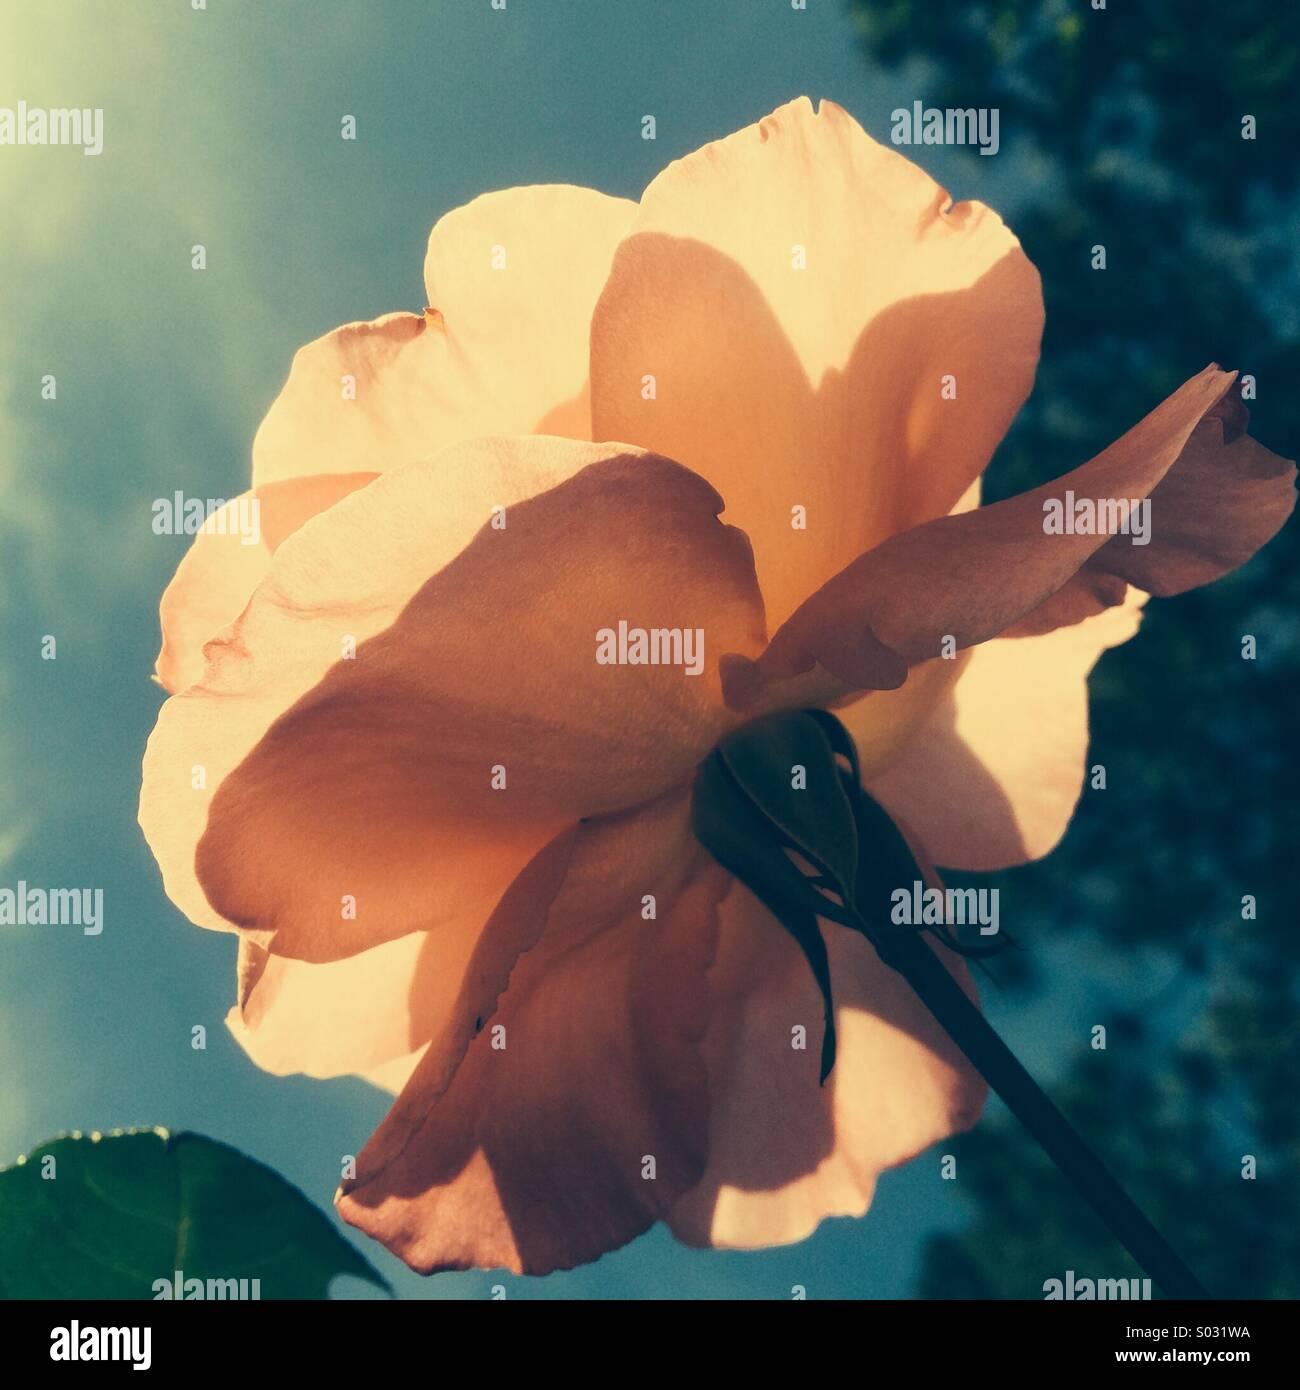 A single rose - Stock Image